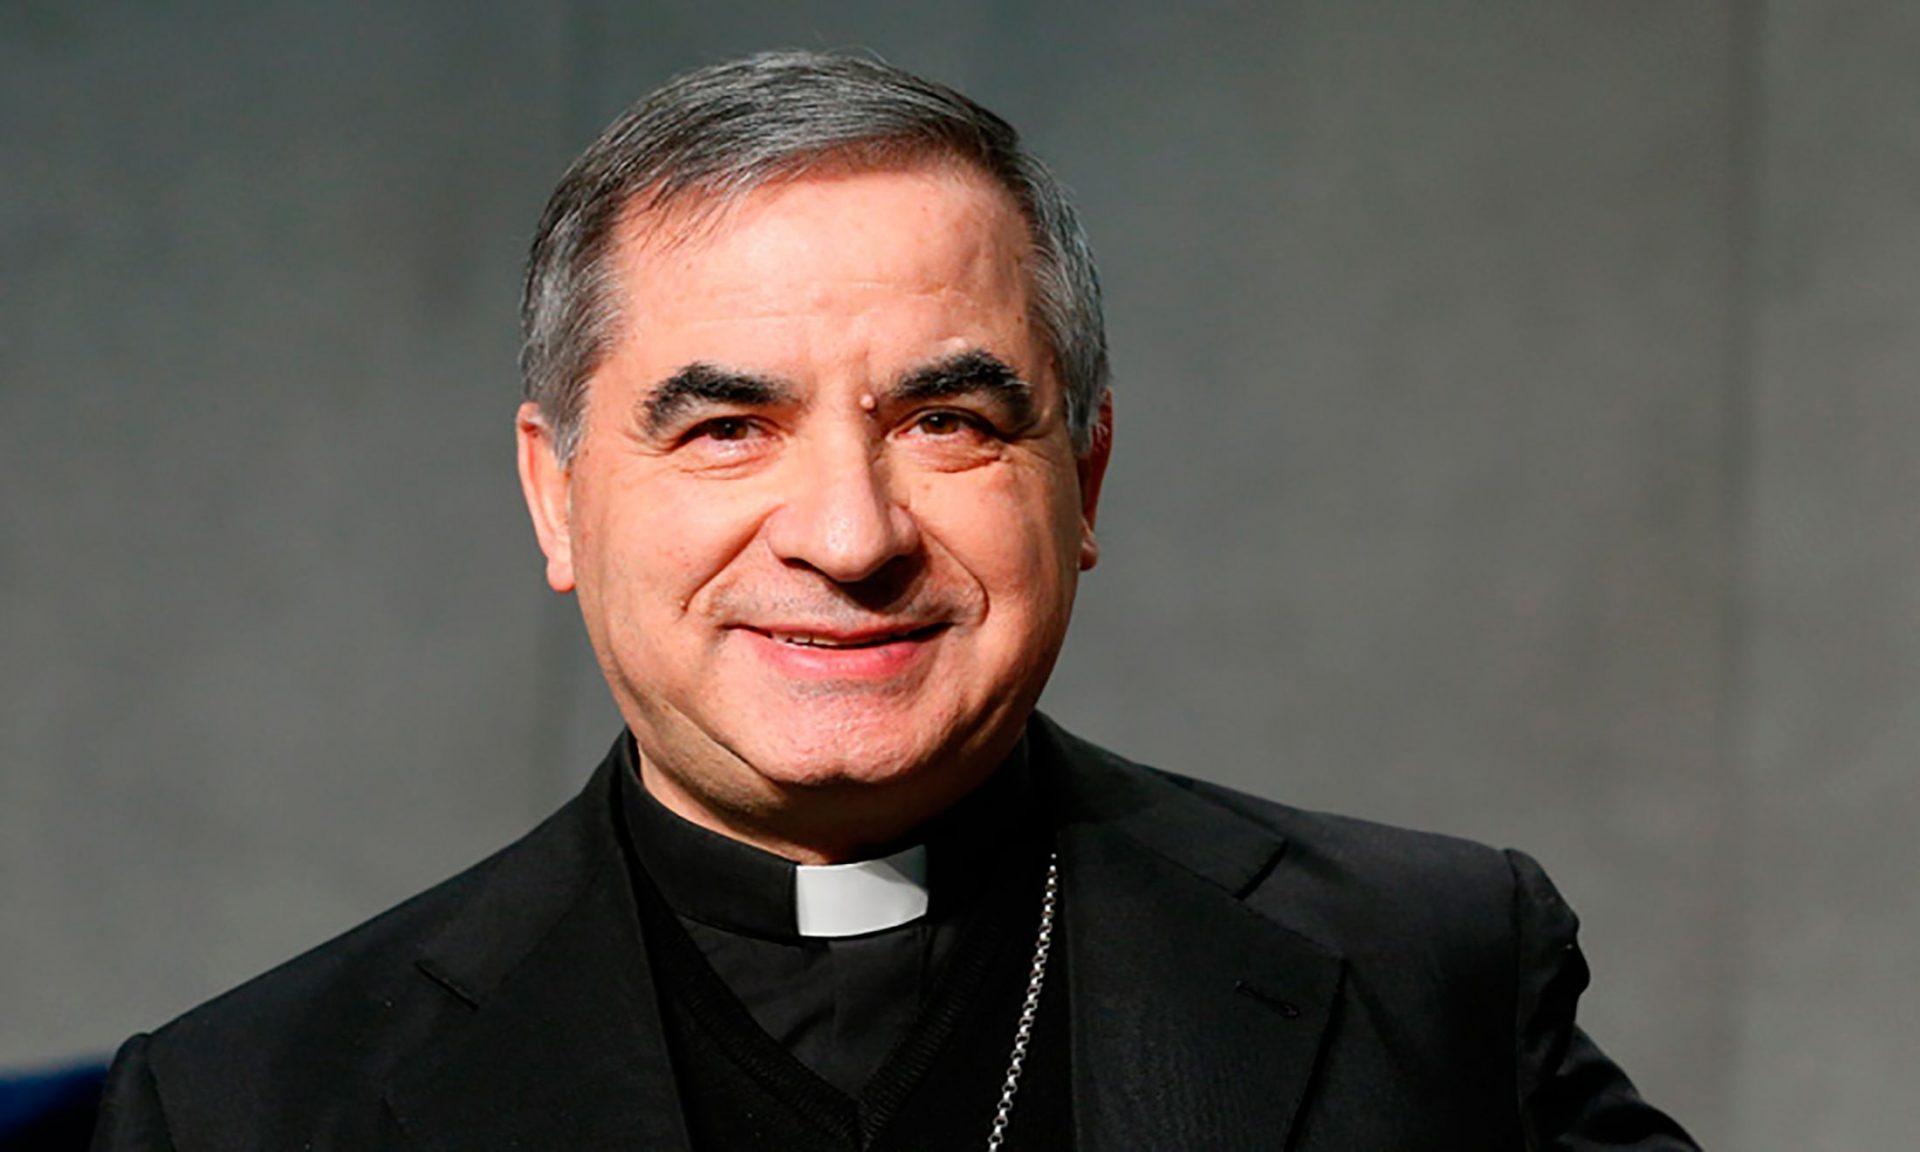 Cardenal Giovanni Angelo Becciu